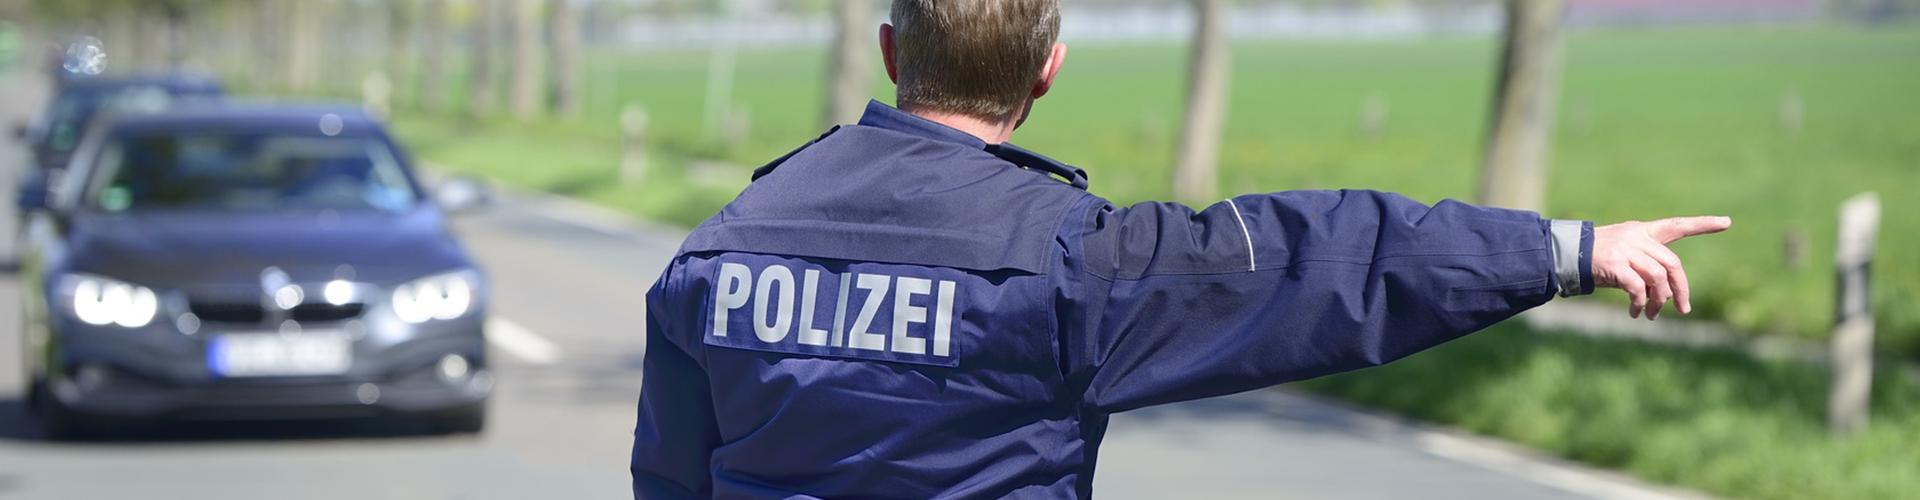 Anwalt Verkehrsstrafrecht Brandenburg